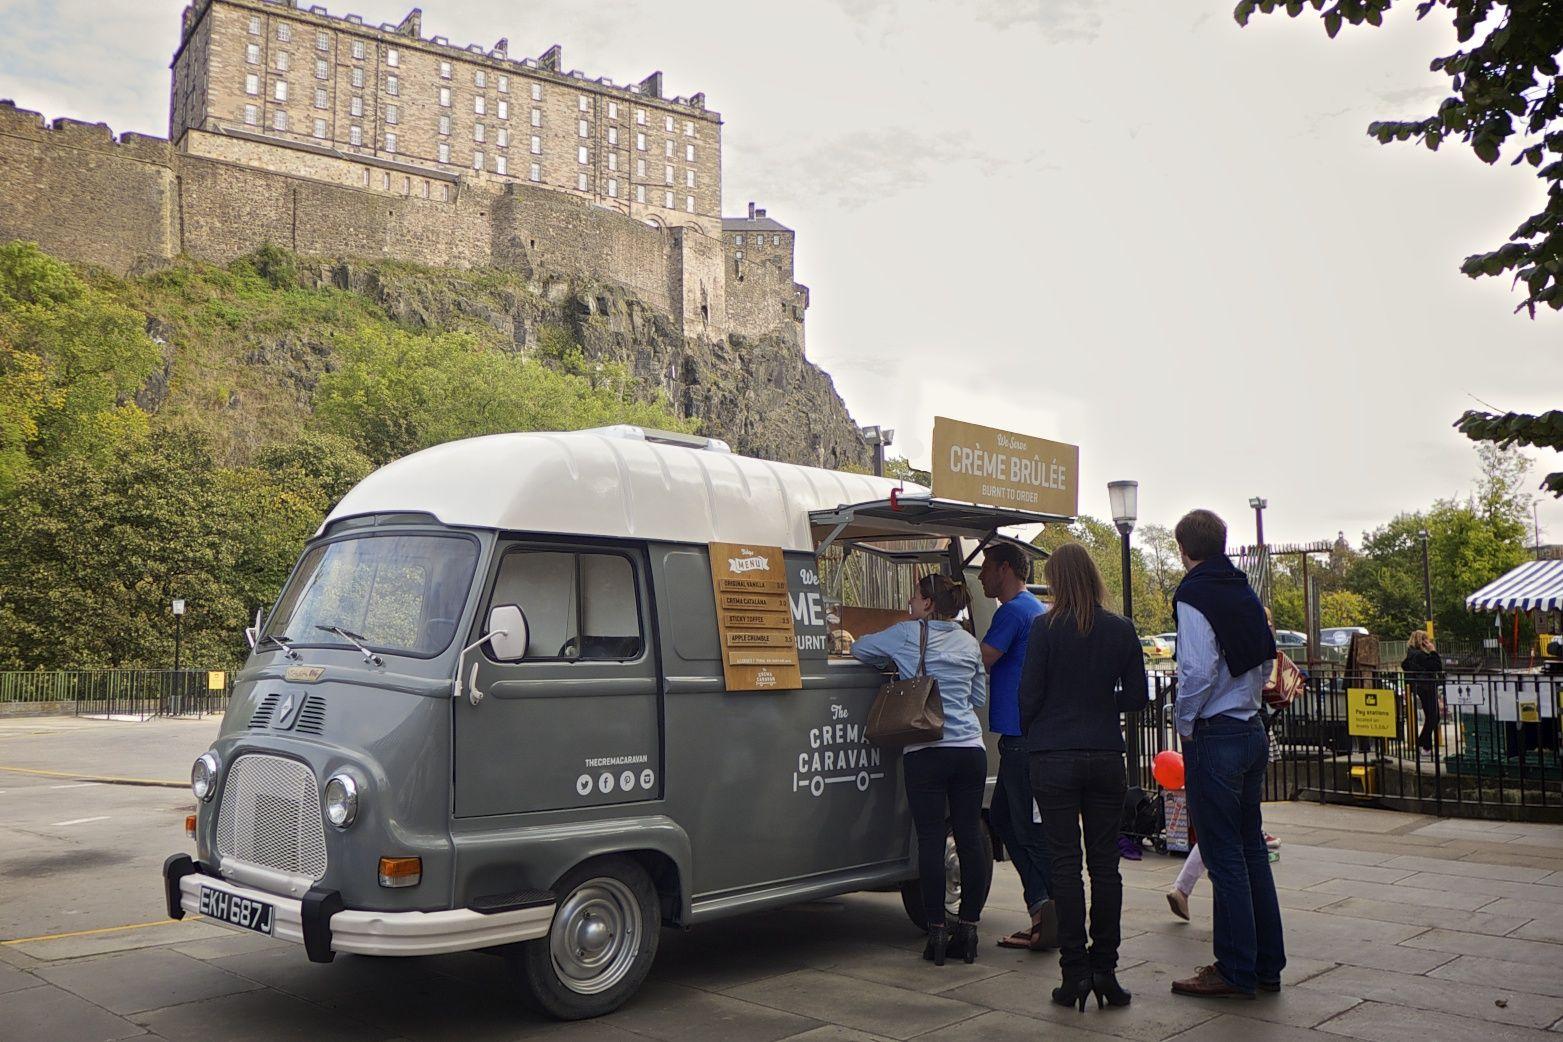 Florence at @edfarmersmarket  #Farmers Market #foodtruck #StreetFood #Edinburgh  #Renault #Estafette #vintage #van